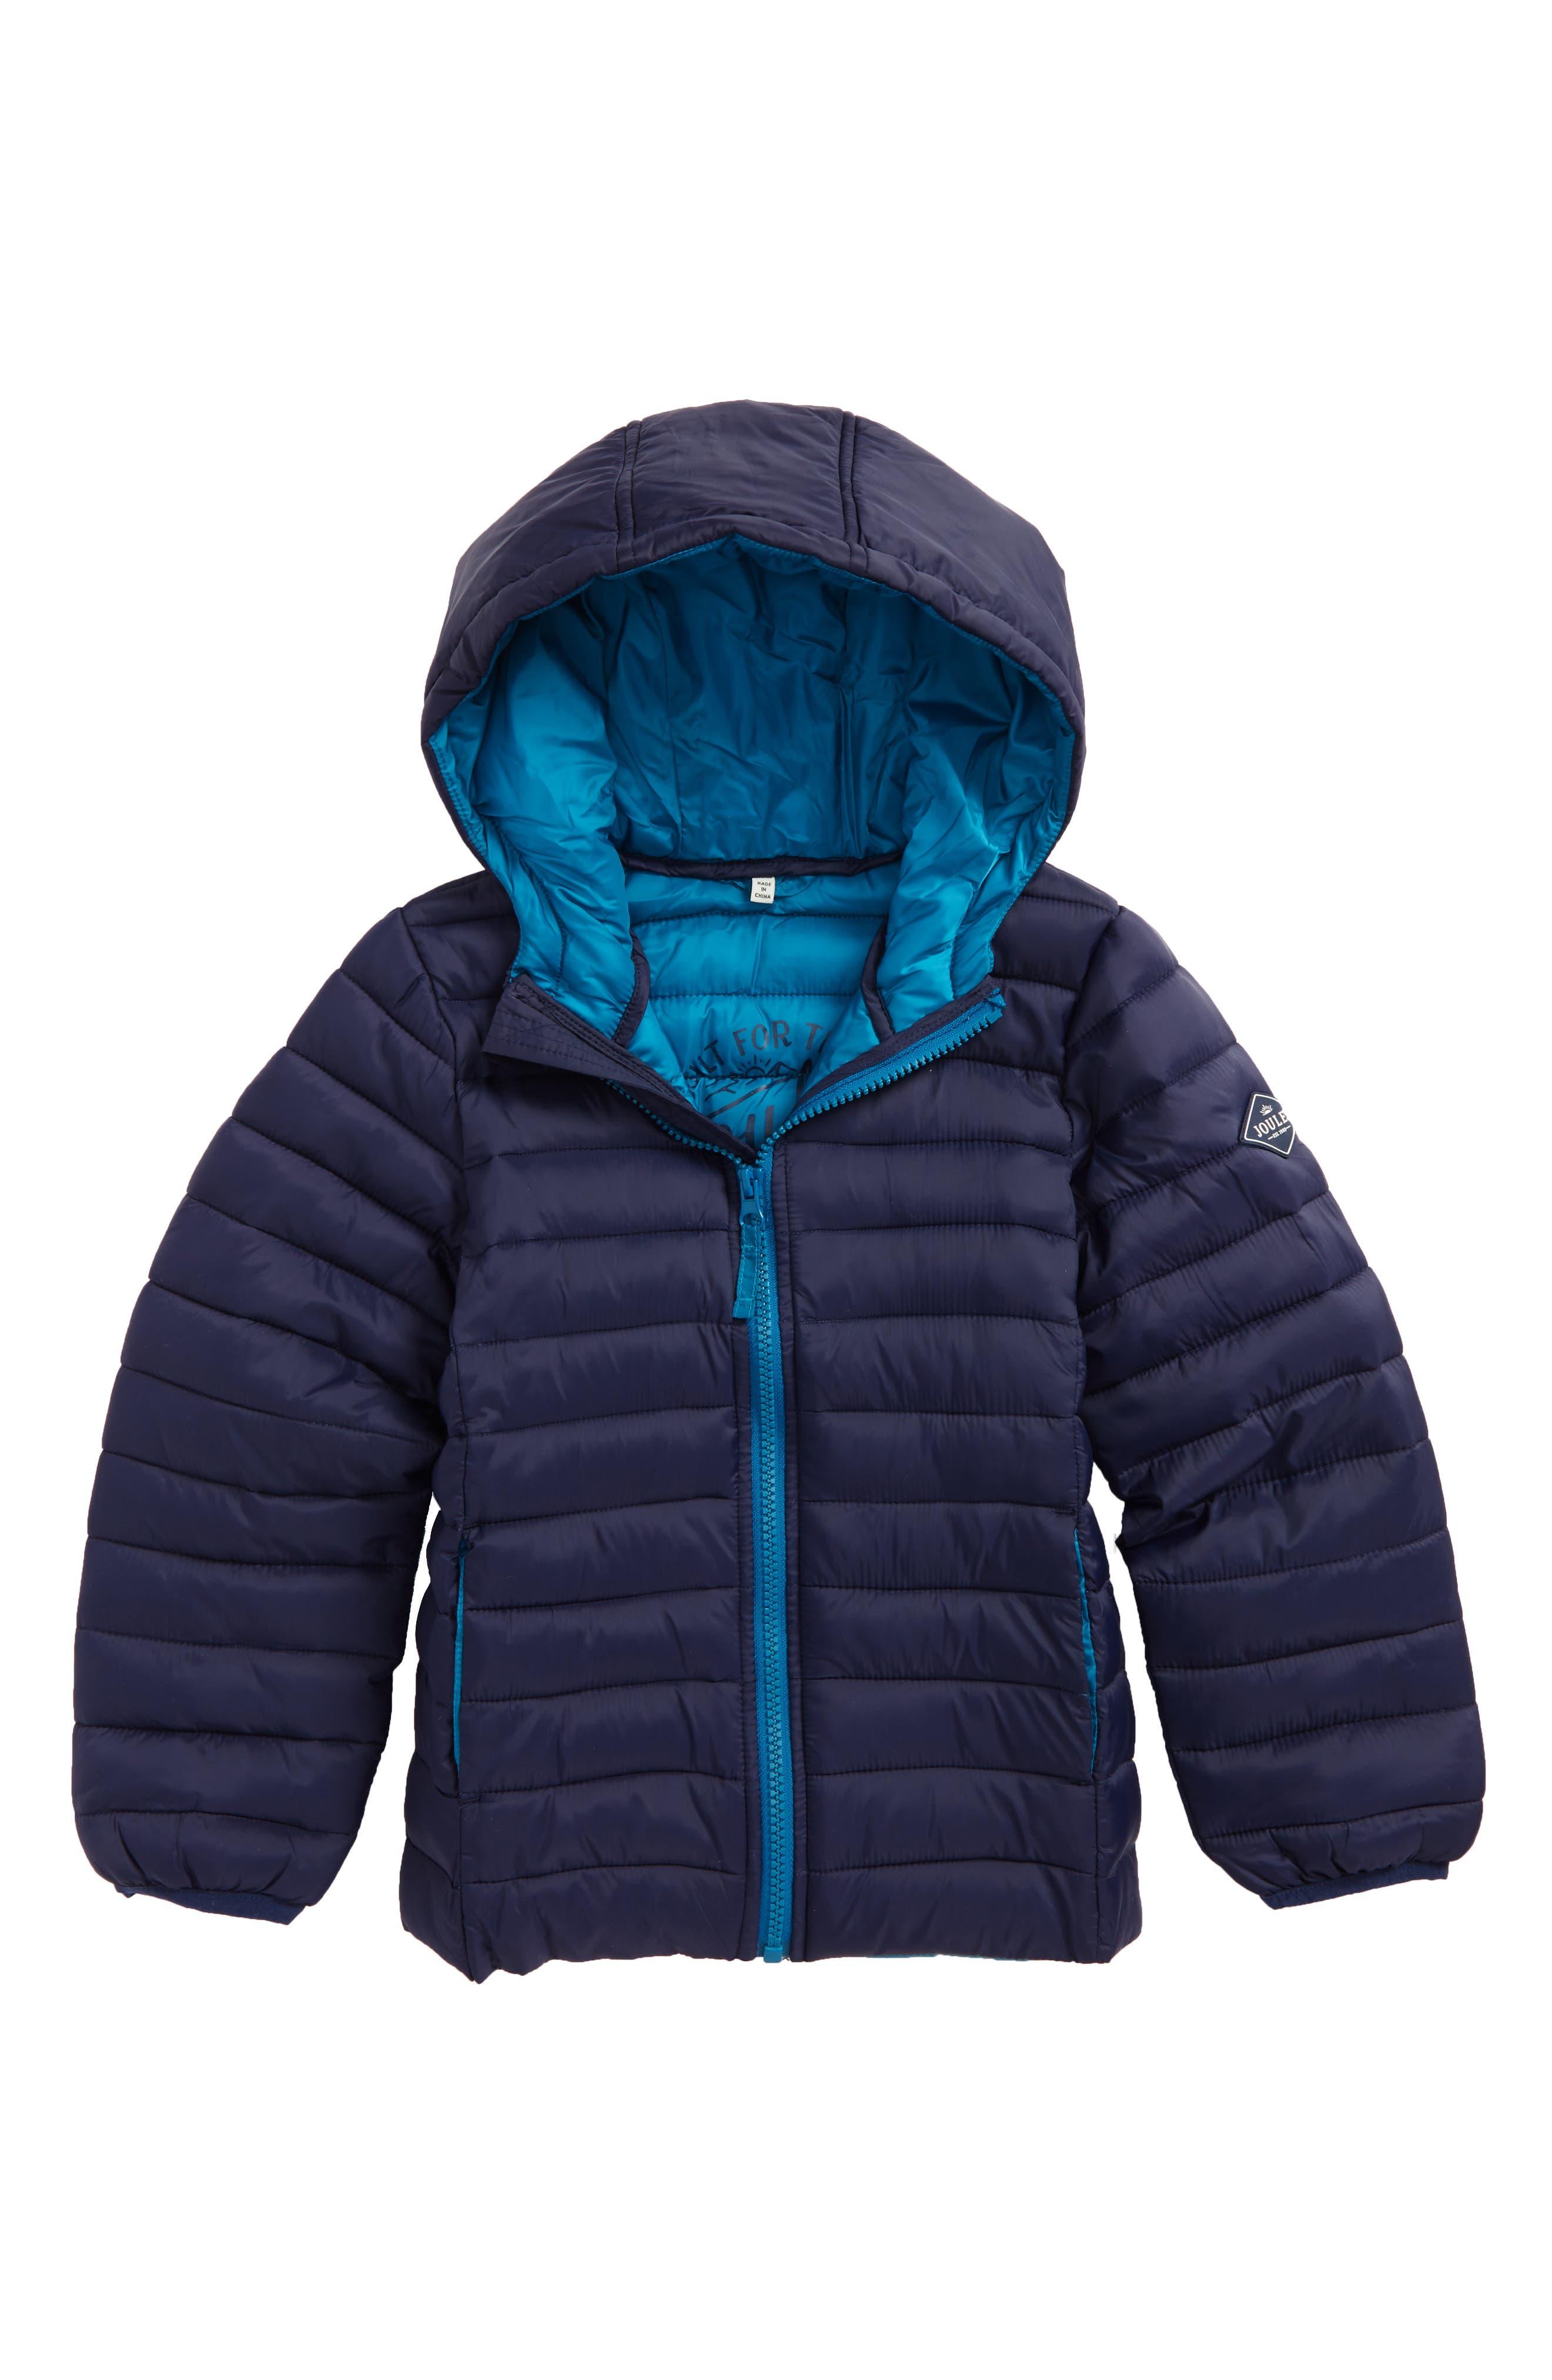 Joules Packaway Hooded Jacket (Toddler Boys, Little Boys & Big Boys)